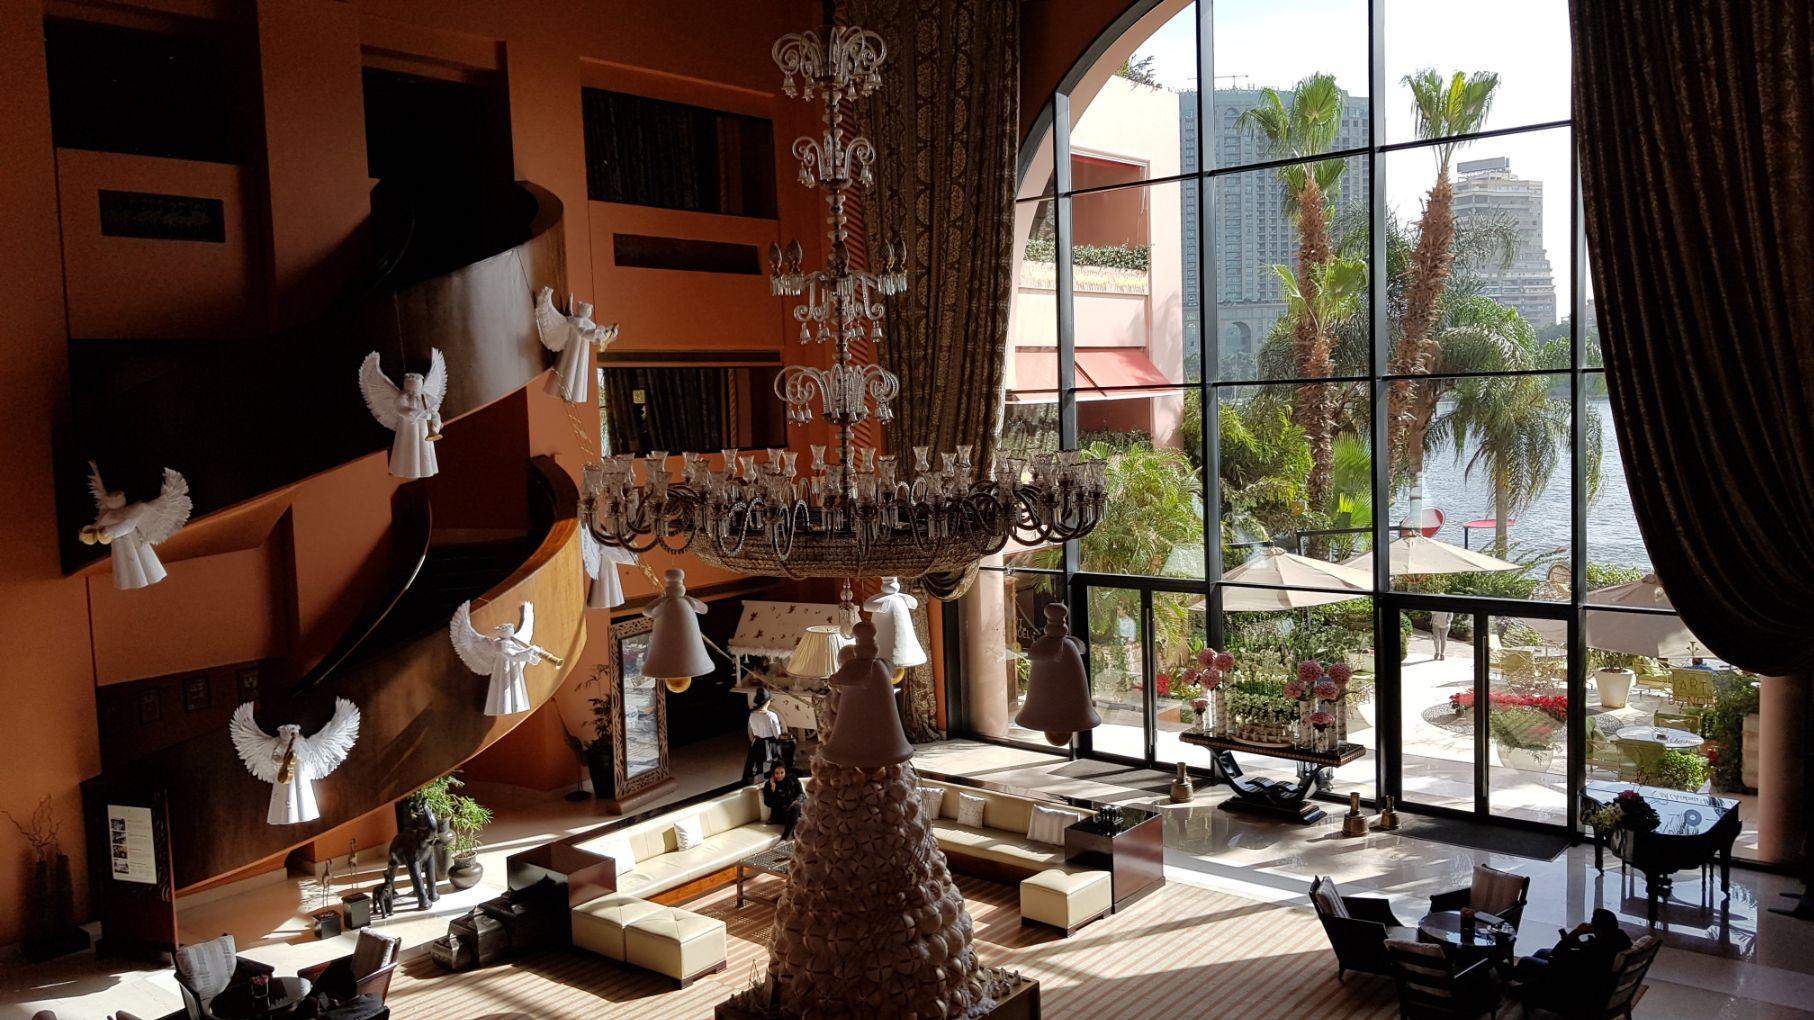 Hotel Sofitel Cairo Nile El Gezirah - Lobby